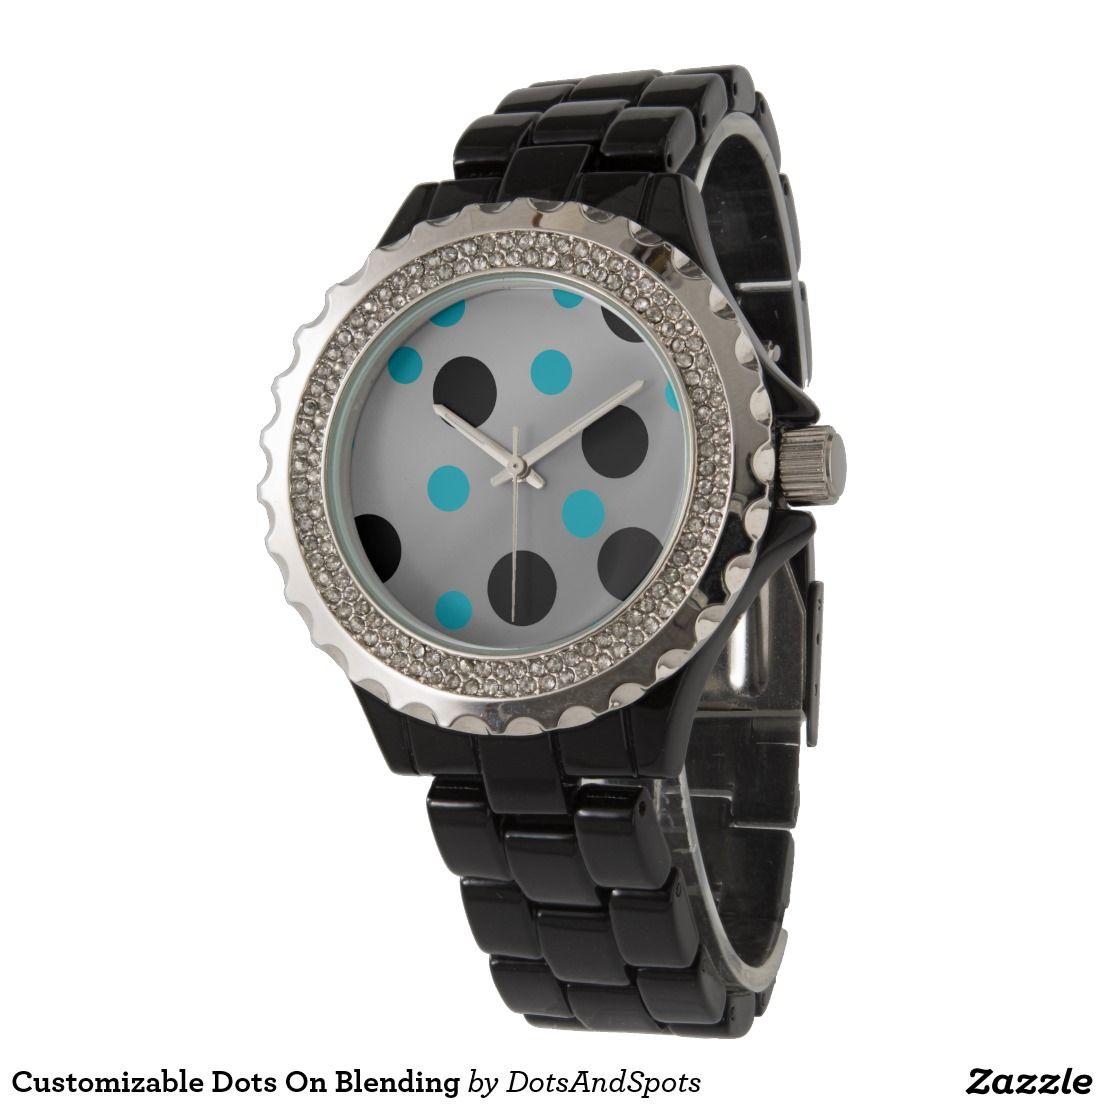 Customizable Dots On Blending Wrist Watches